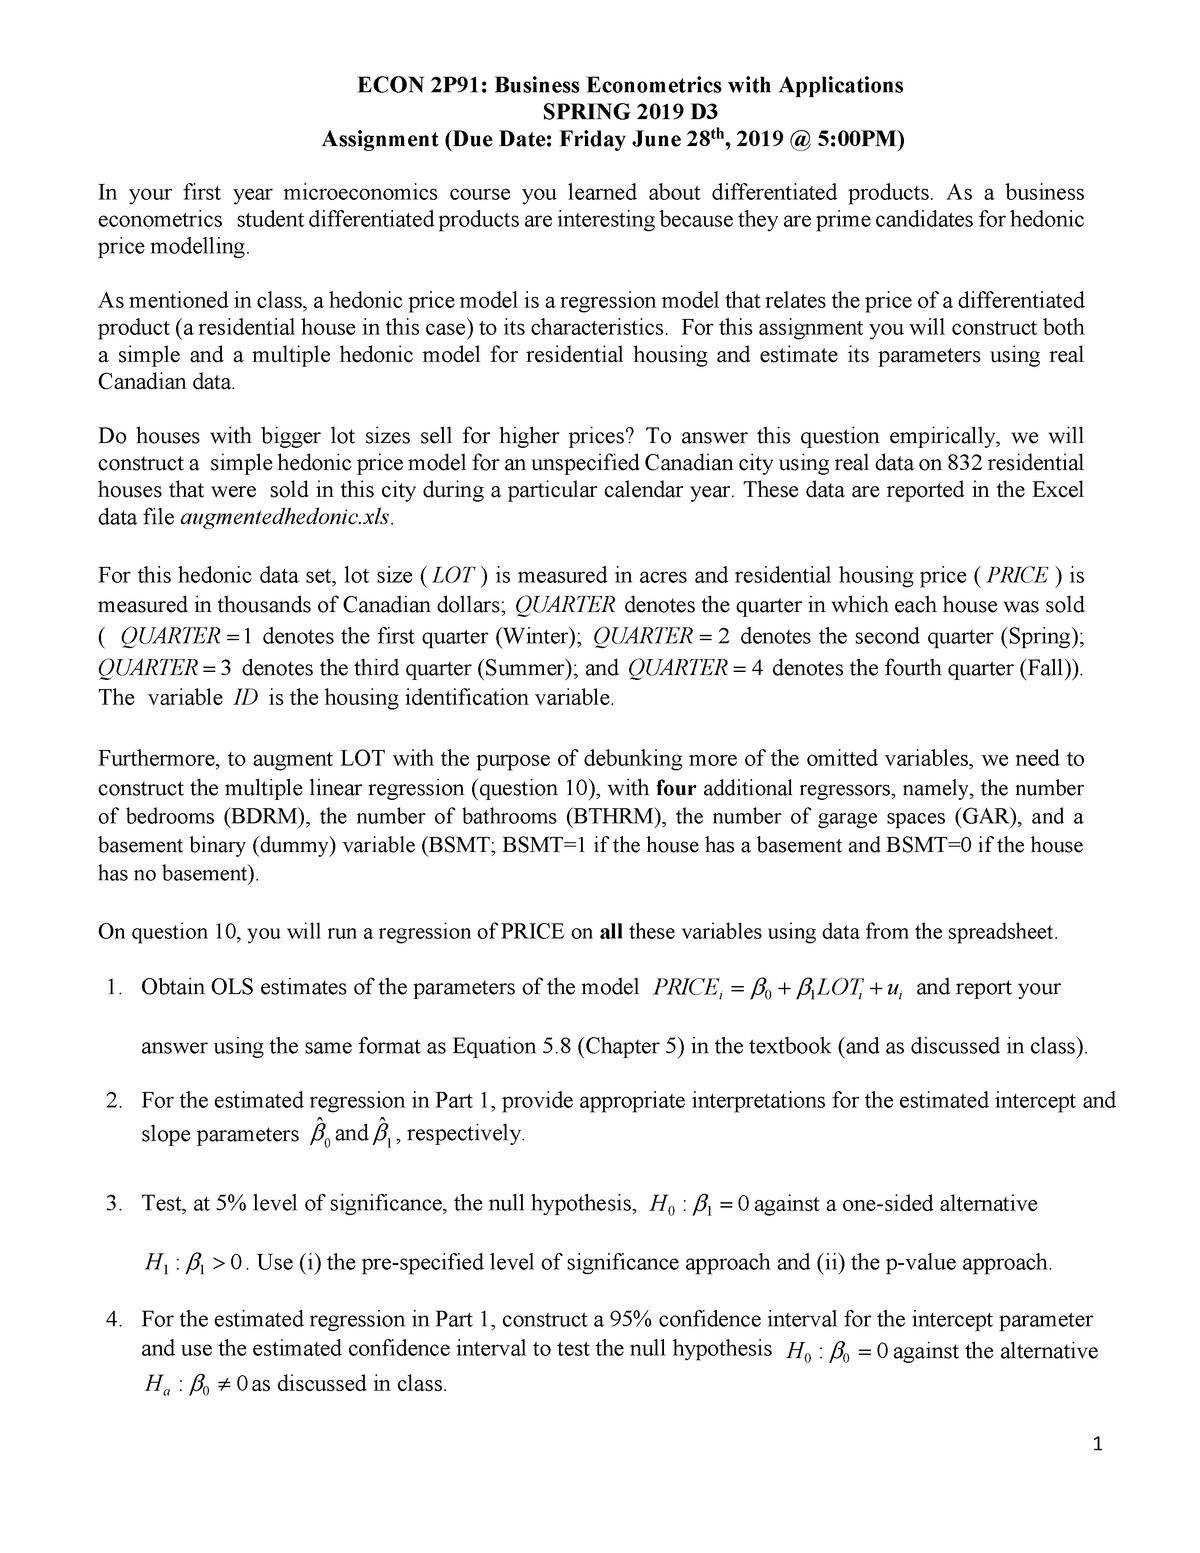 ECON2P91 SP19-Assignment - ECON 2P91 - Brocku - StuDocu